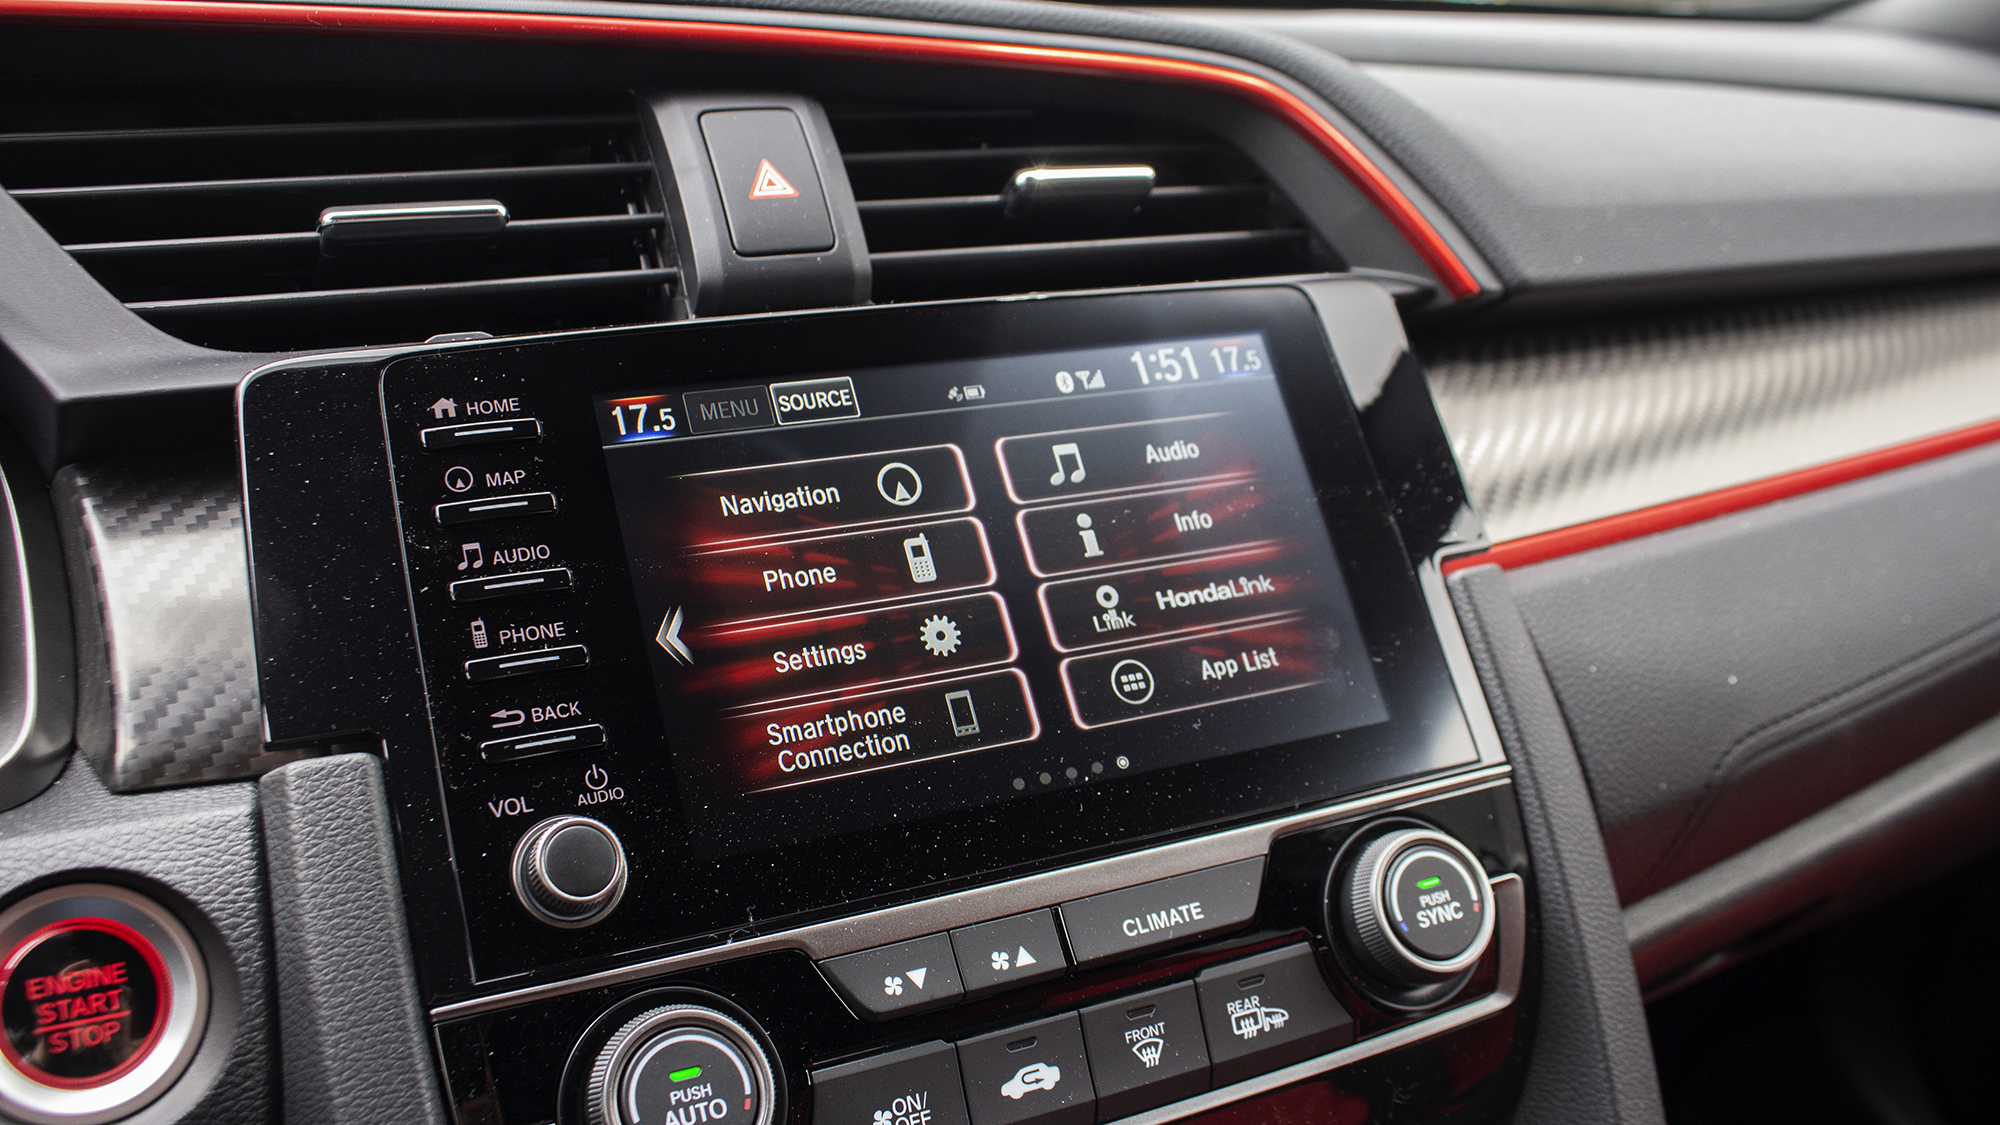 2021 Honda Civic Type R infotainment